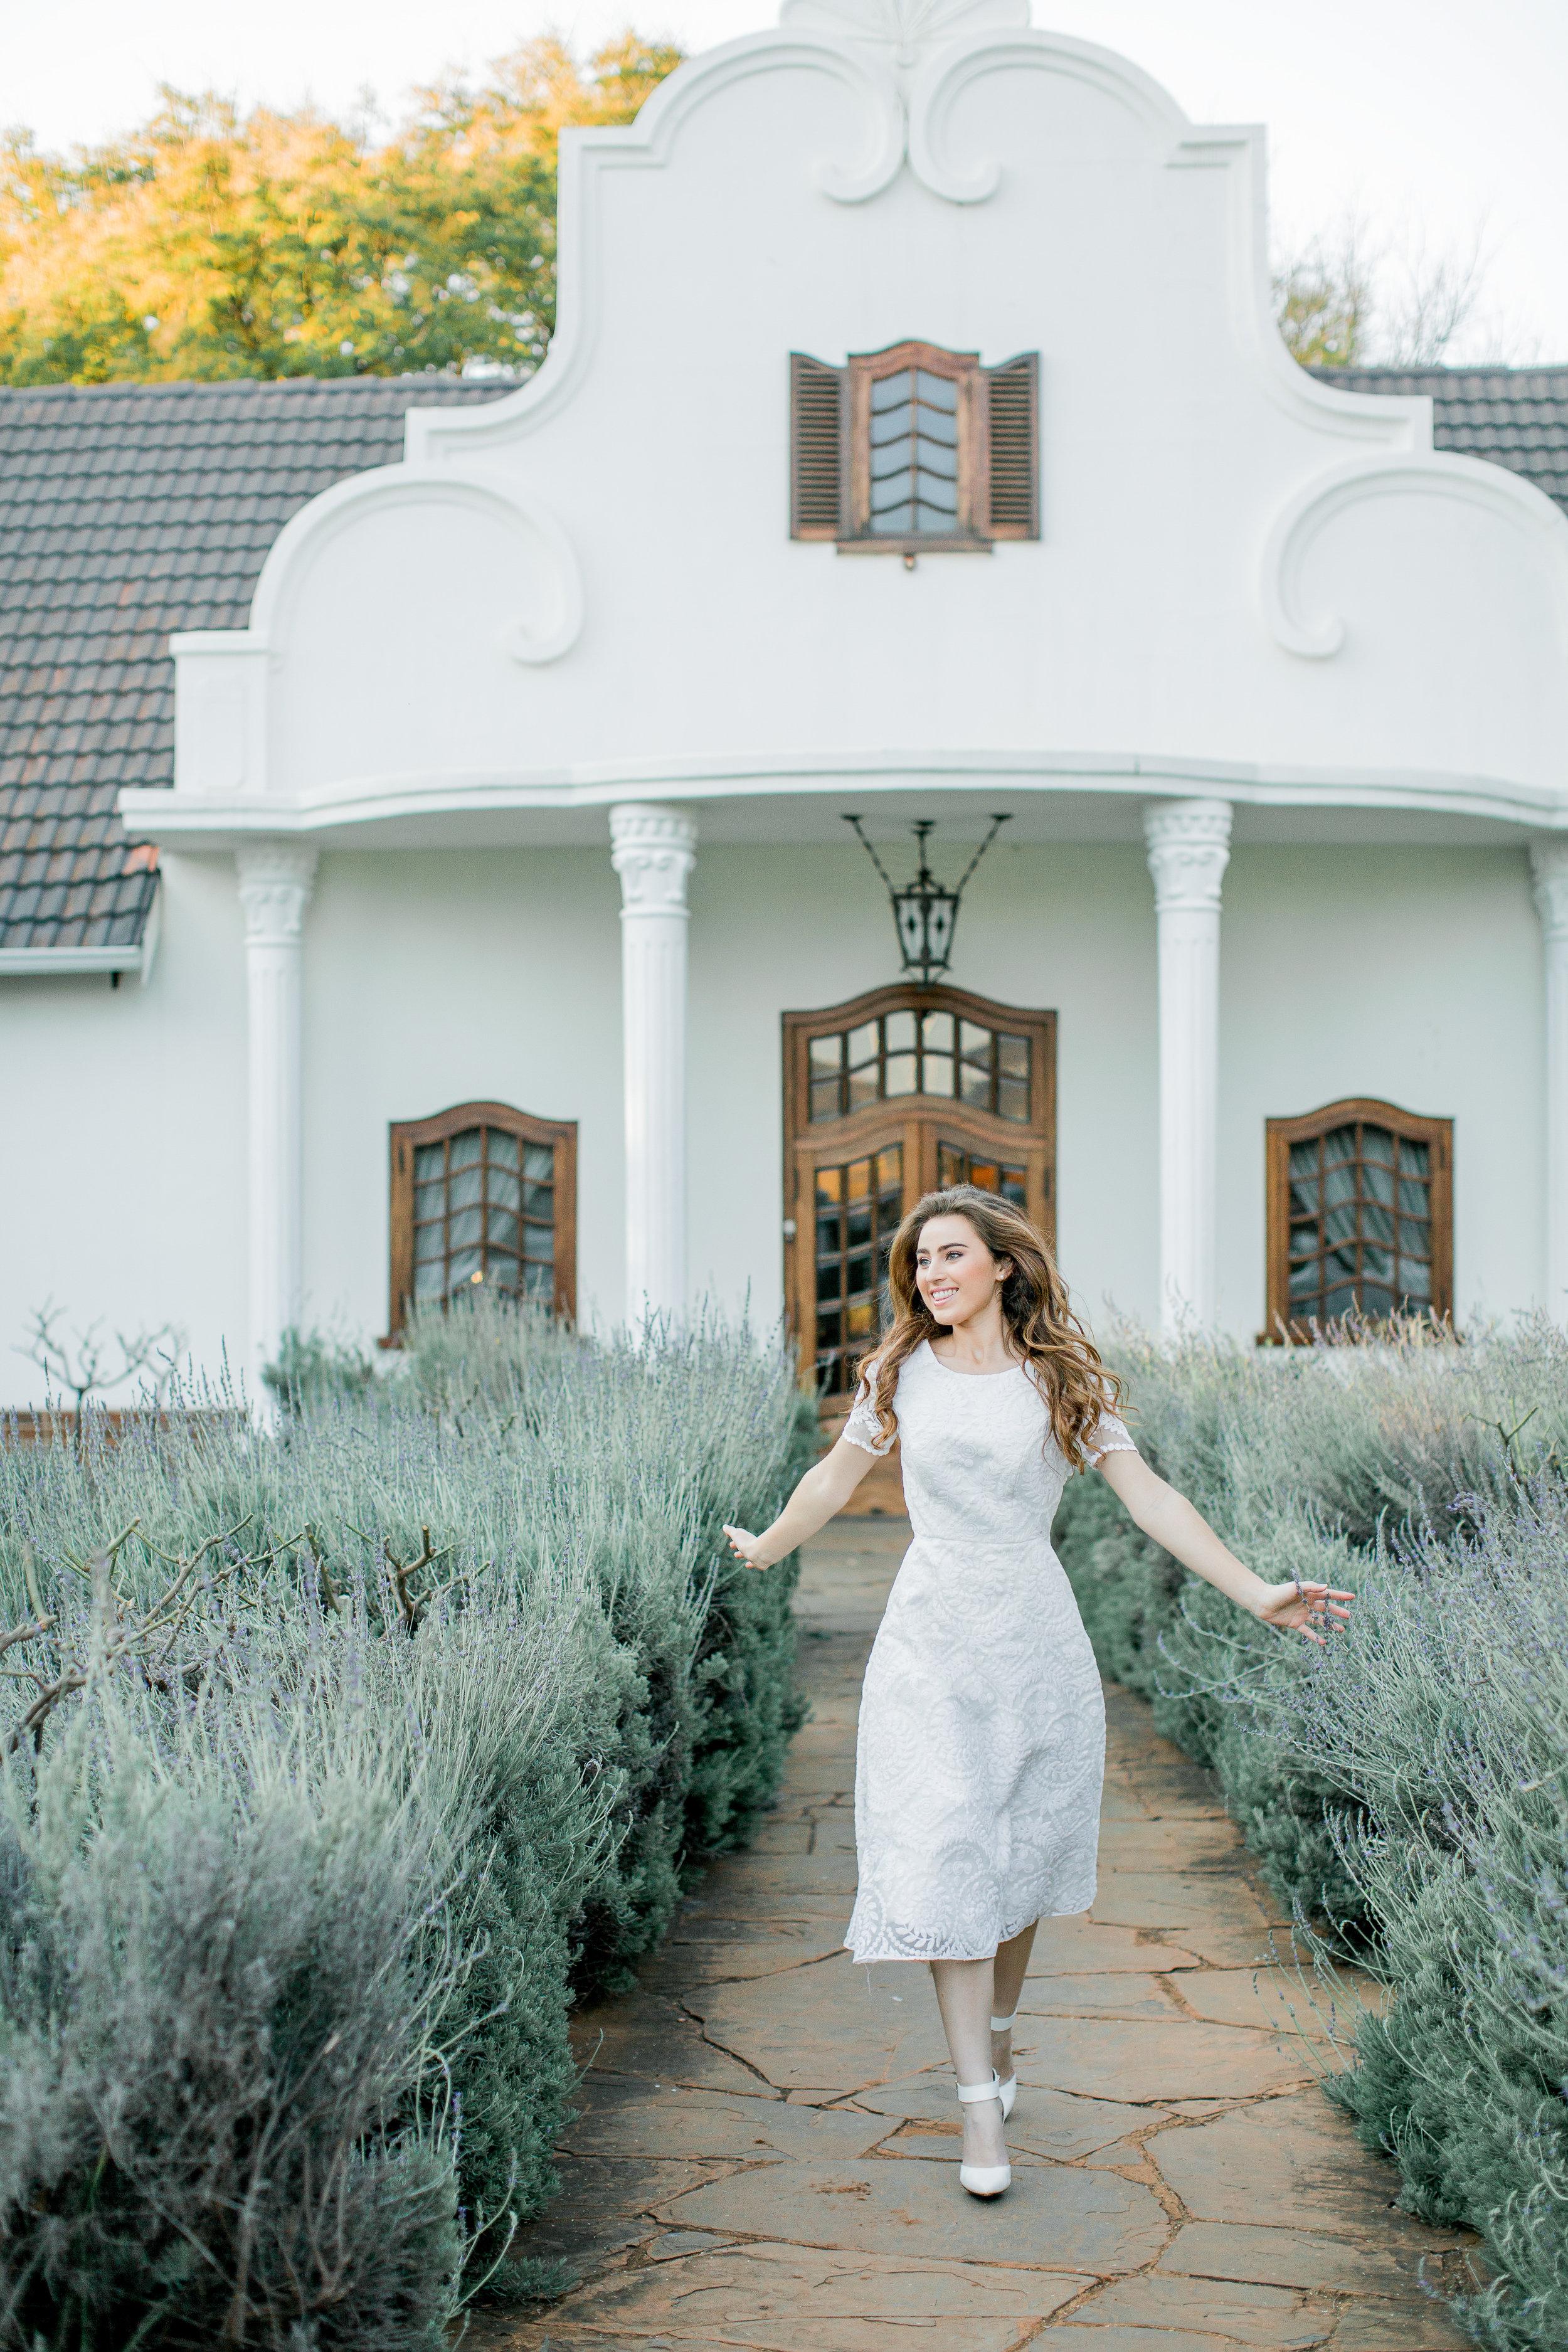 gauteng wedding photographer clareece smit13.jpg